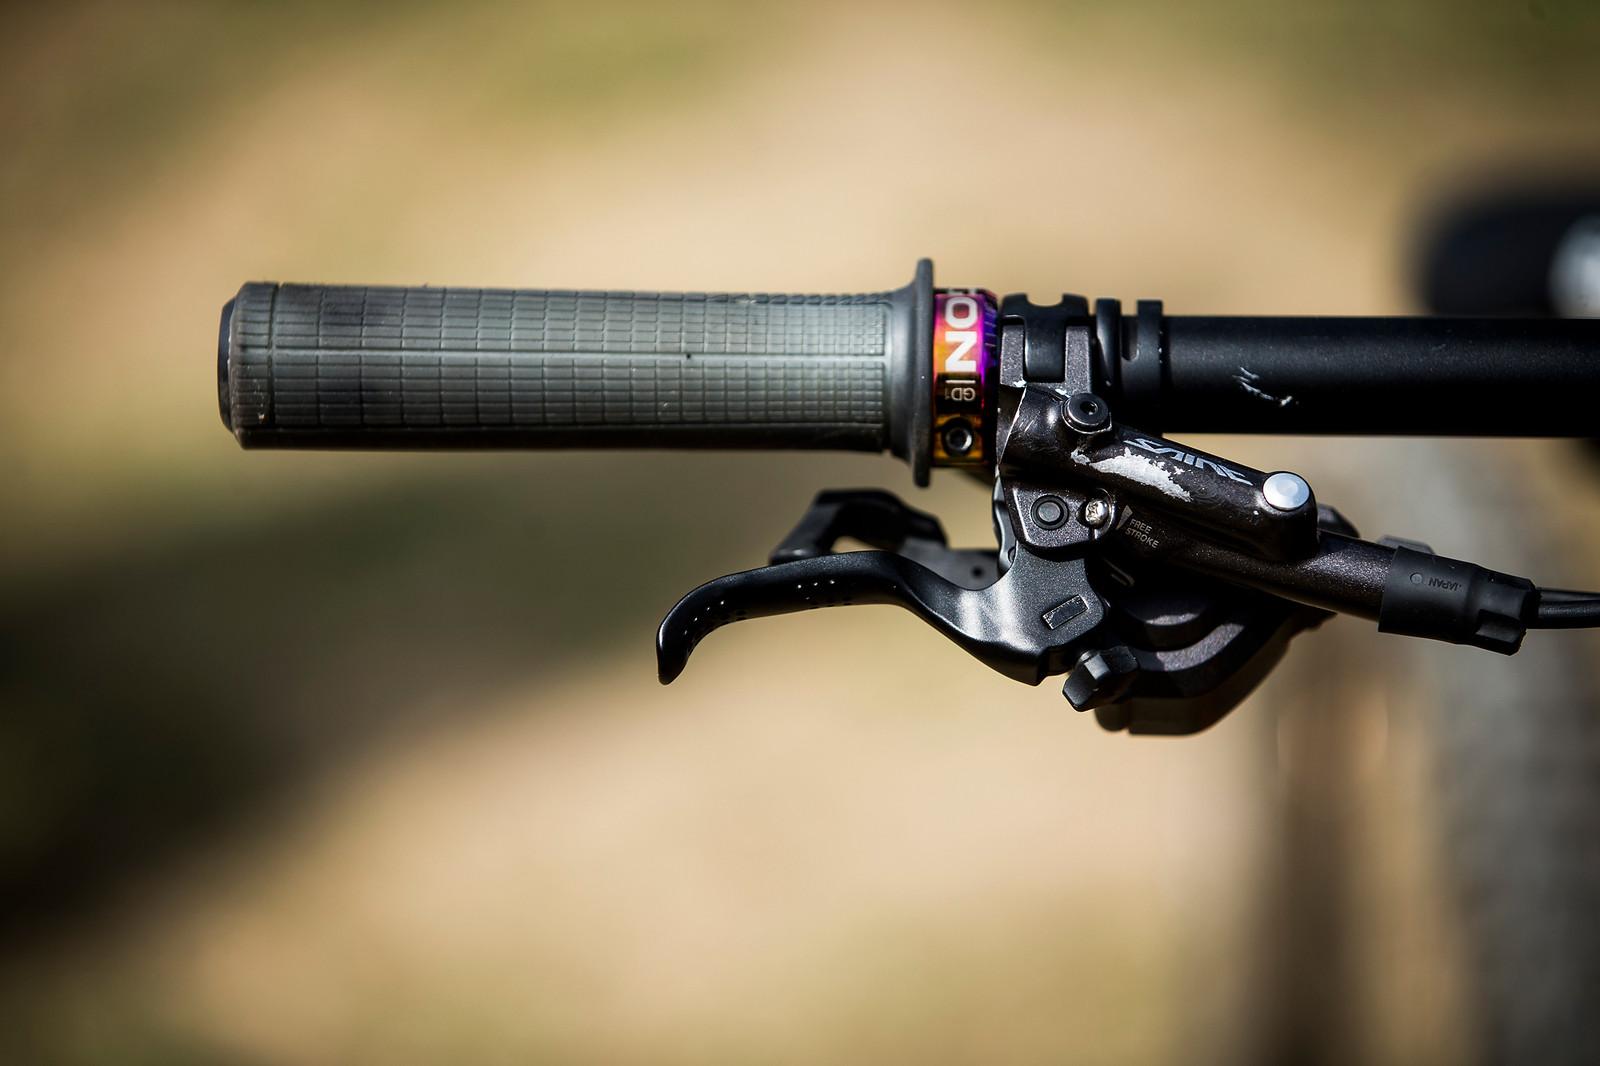 Ergon GD1 Grips and Shimano Saint Brake Levers - WINNING BIKE: Tahnee Seagrave's Transition TR11 - Mountain Biking Pictures - Vital MTB